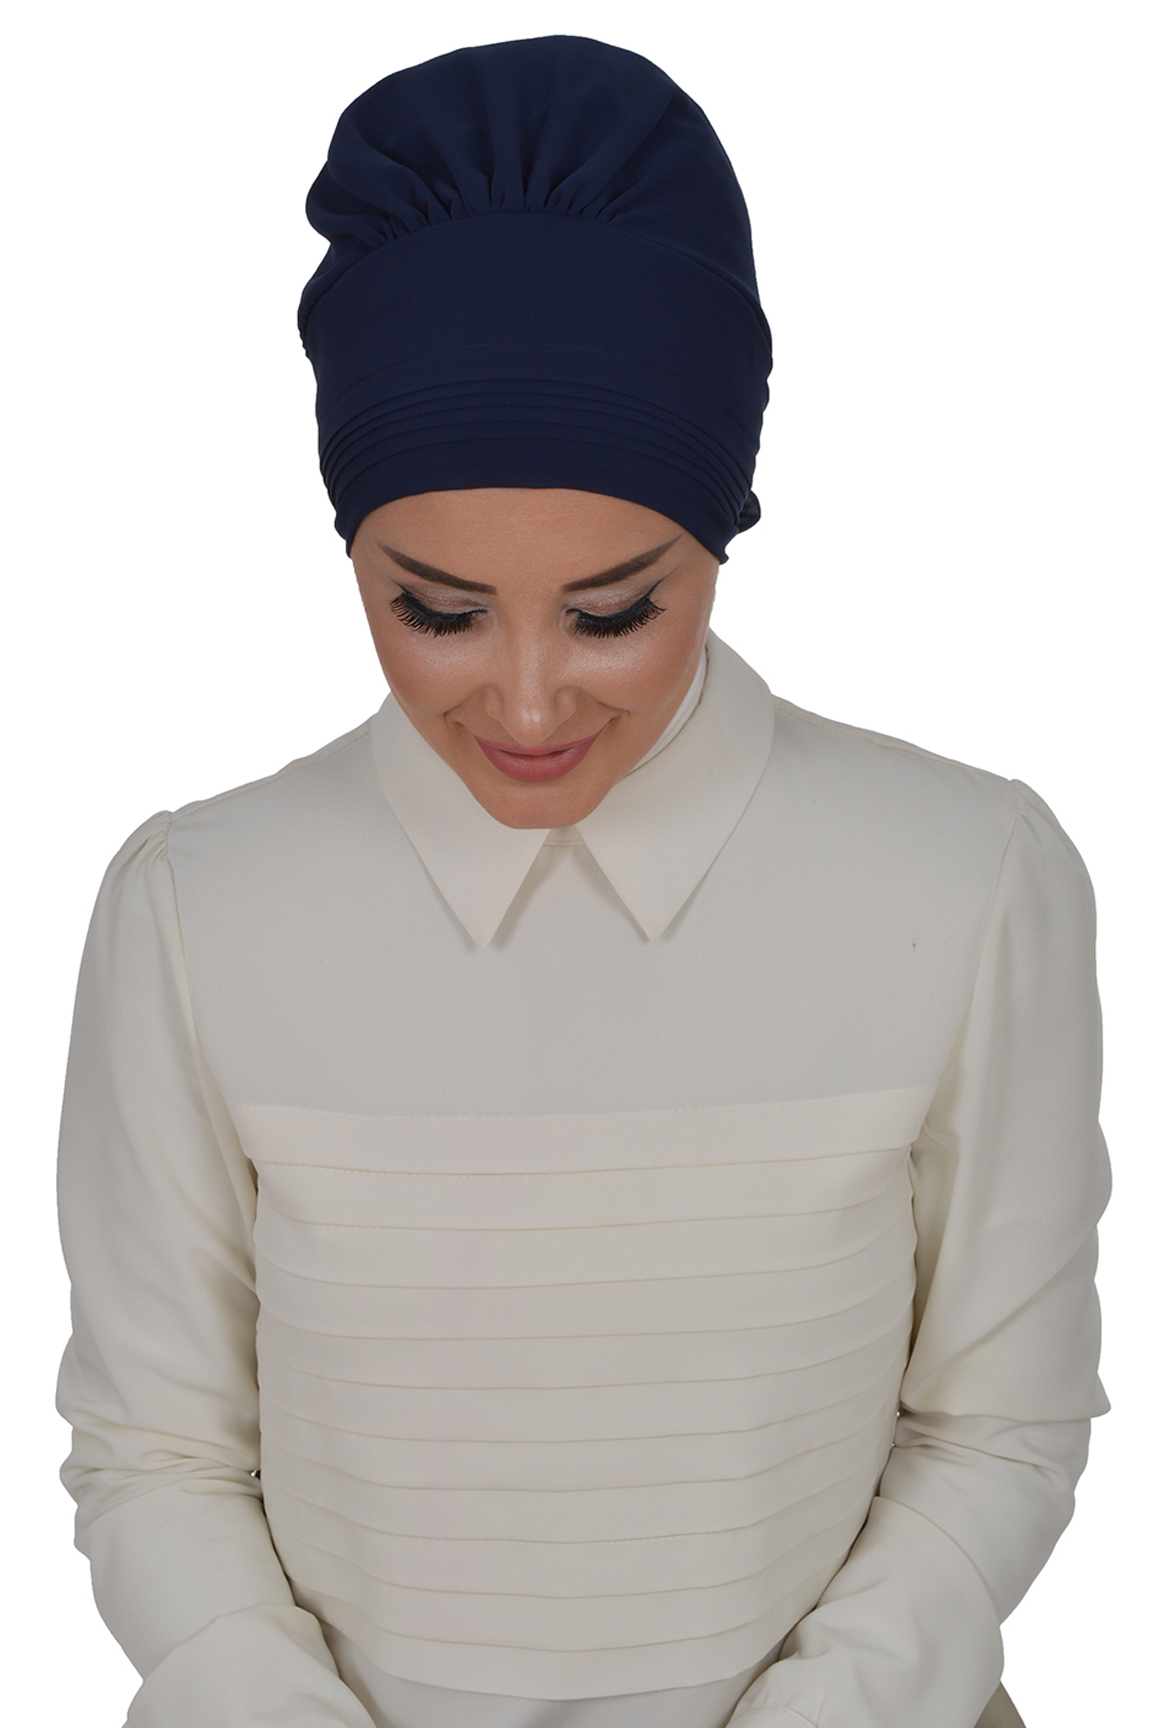 Islamic Easy Ready Muslim Hijab Instant Chiffon Turban Ebay Instan Simple Pet